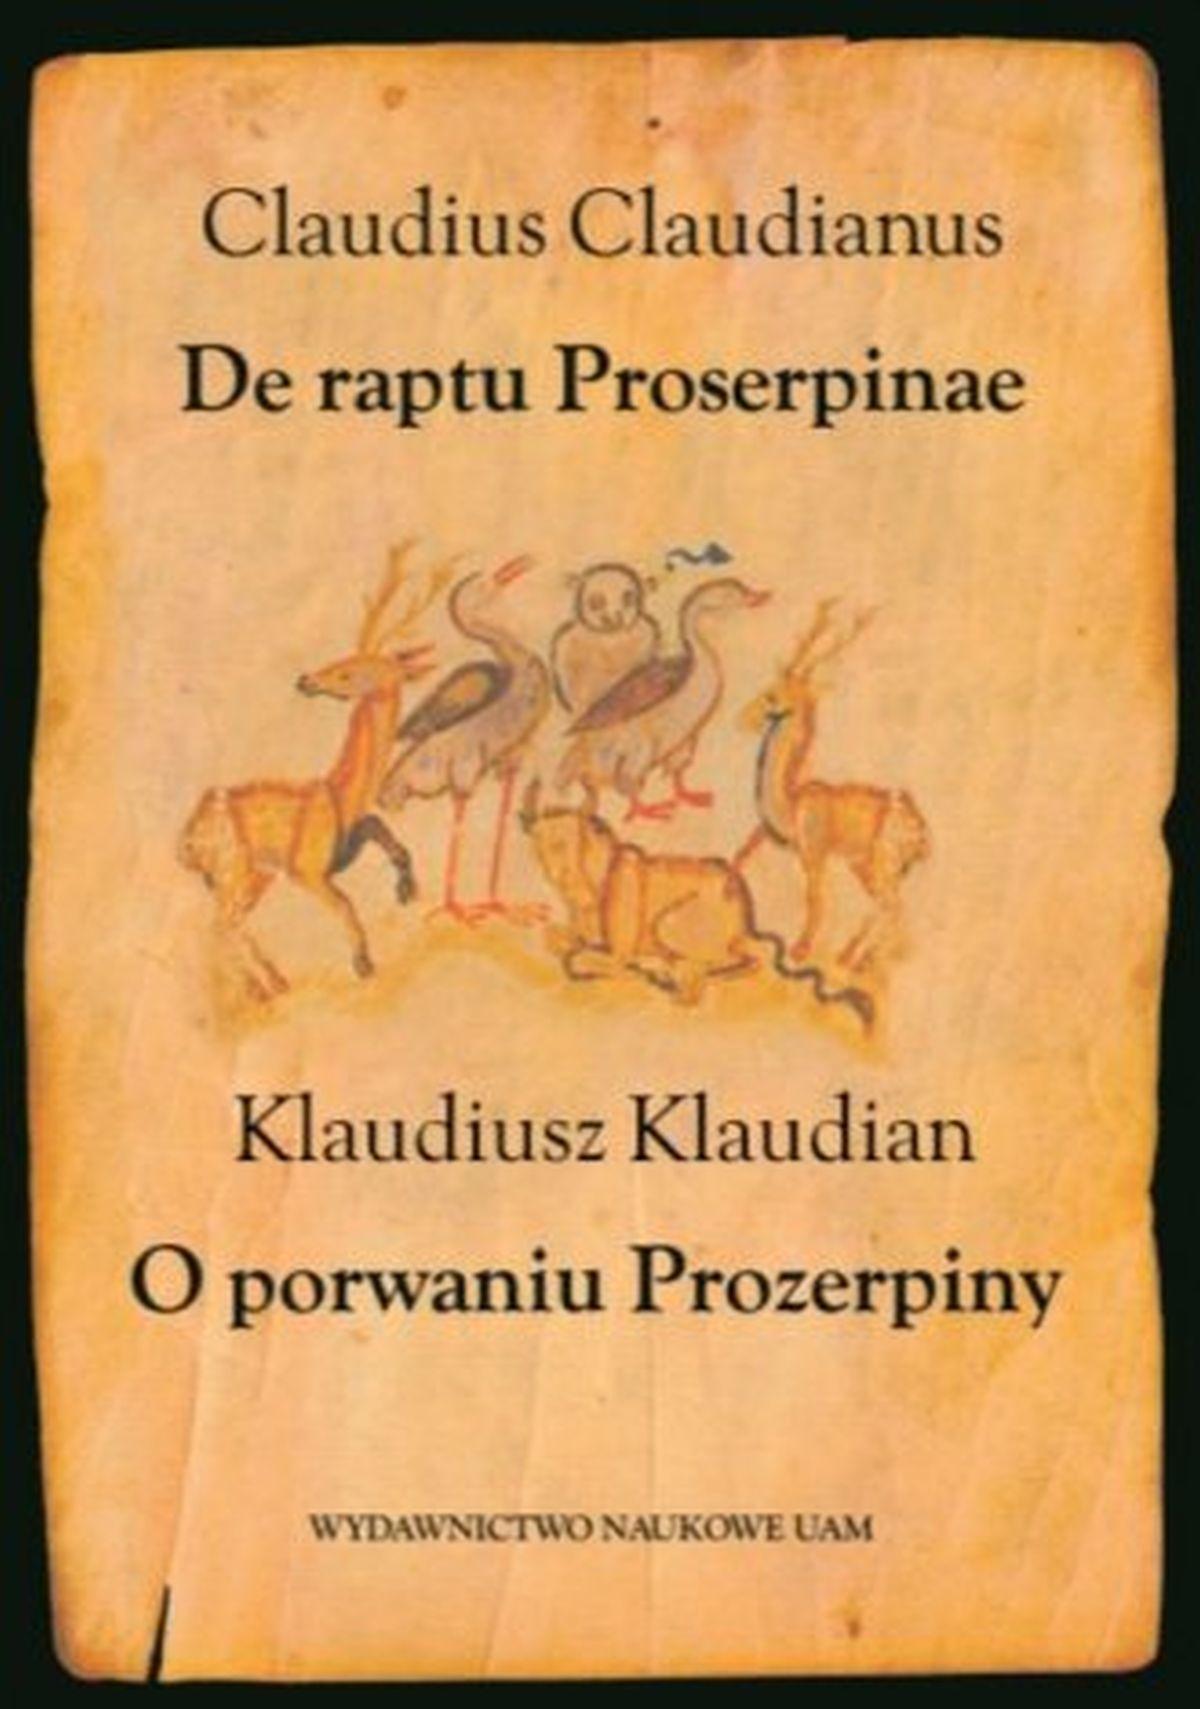 Klaudiusz Klaudian, O porwaniu Prozerpiny